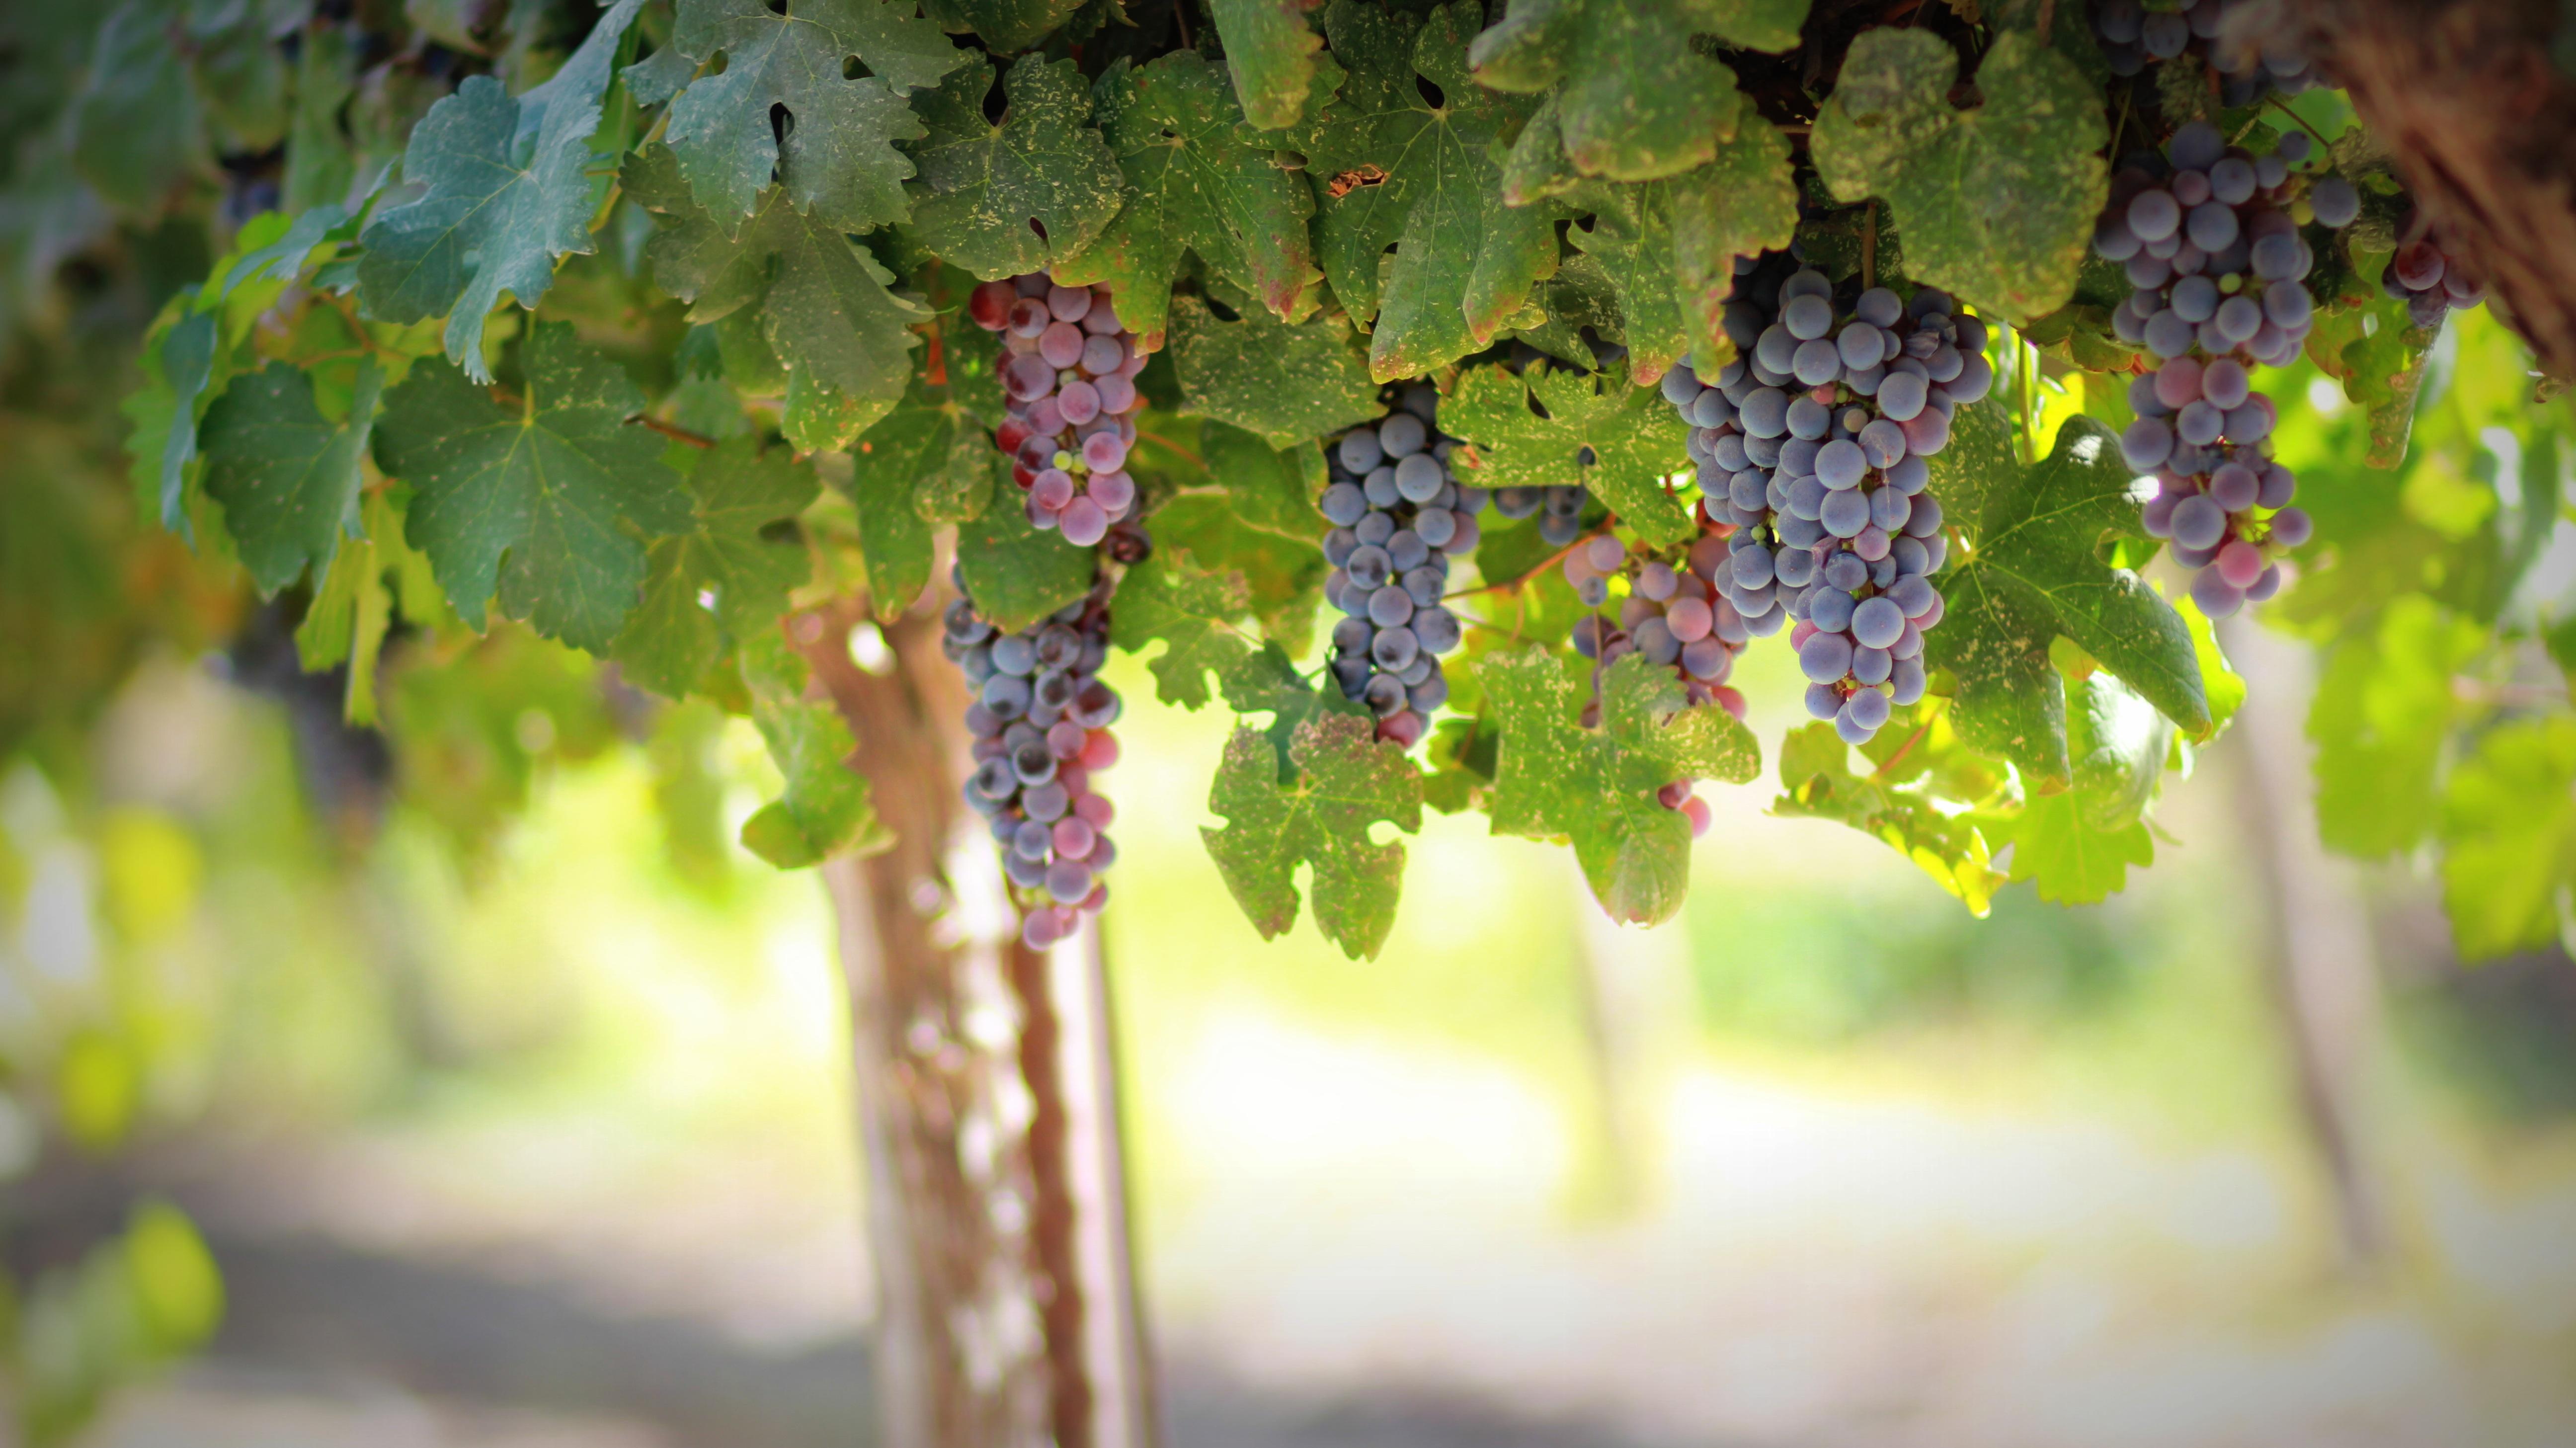 Free Images Tree Nature Branch Grape Vine Vineyard